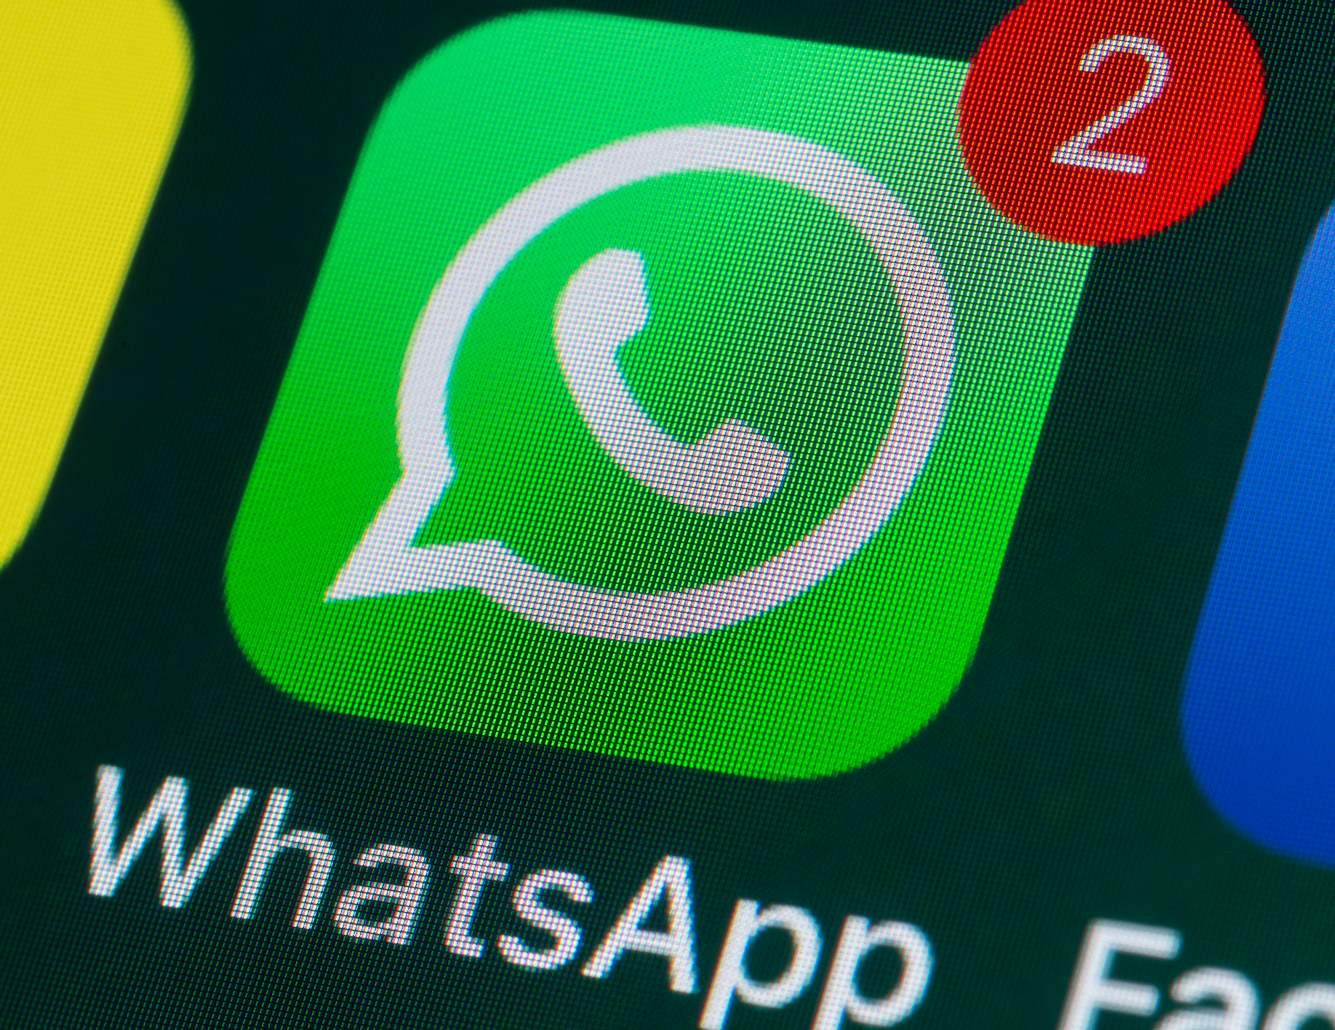 WhatsApp auf Display